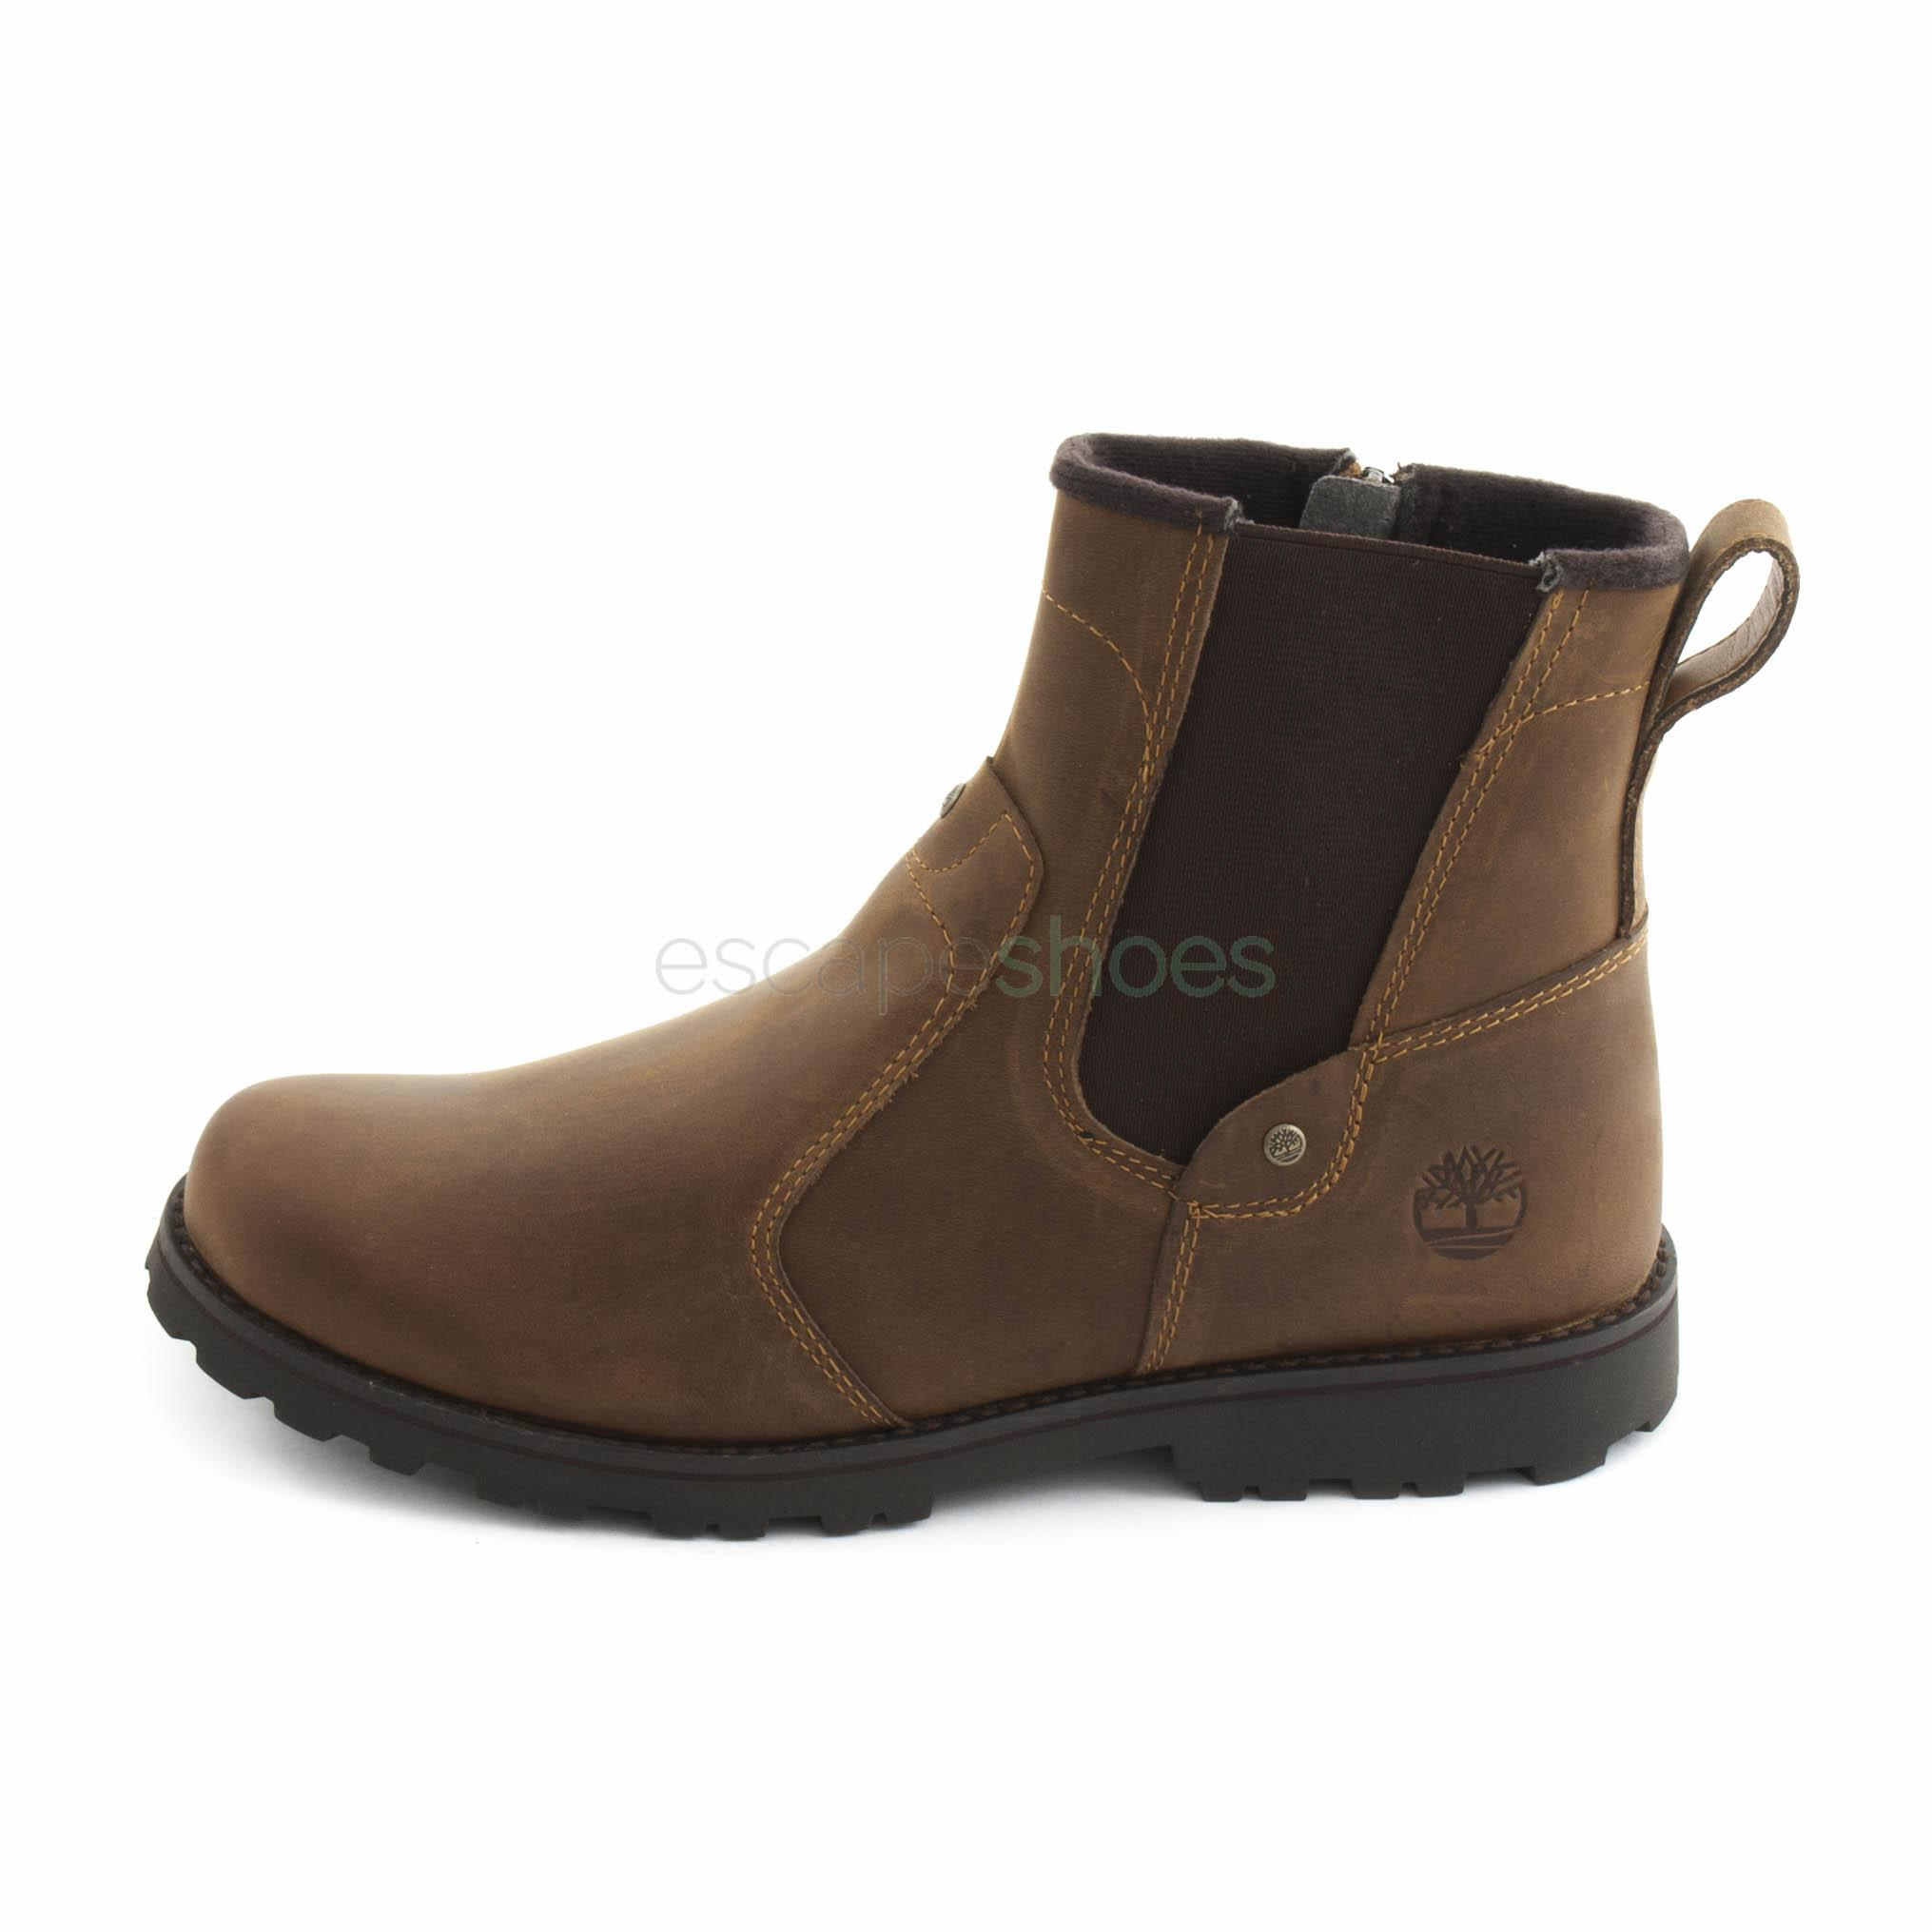 Timberland Asphalt Trail jungen Junior Chelsea Boots | Fruugo